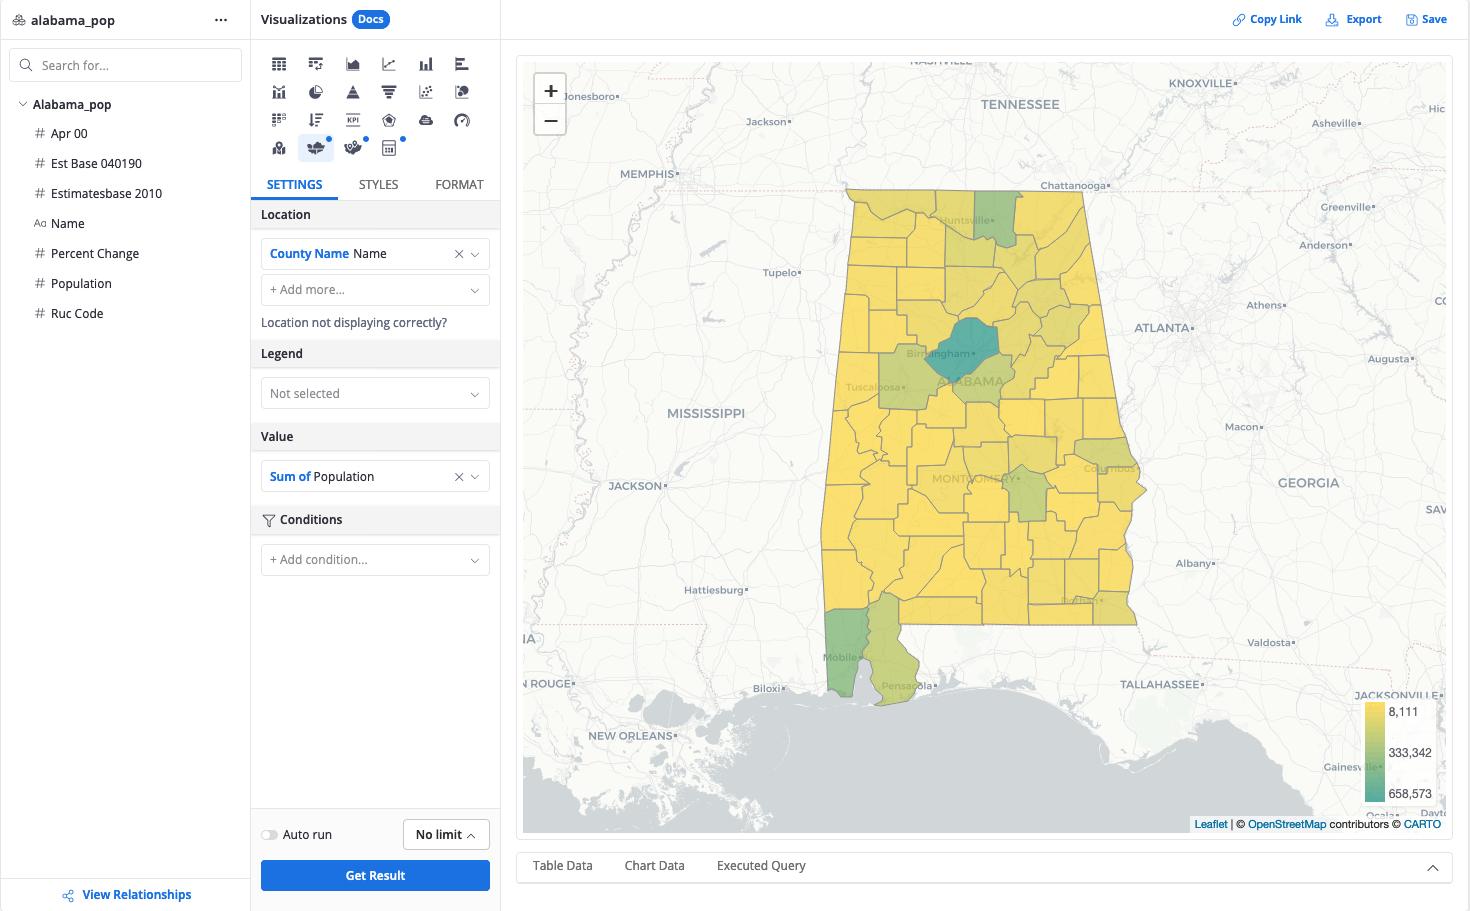 Custom map of Alabama counties' population